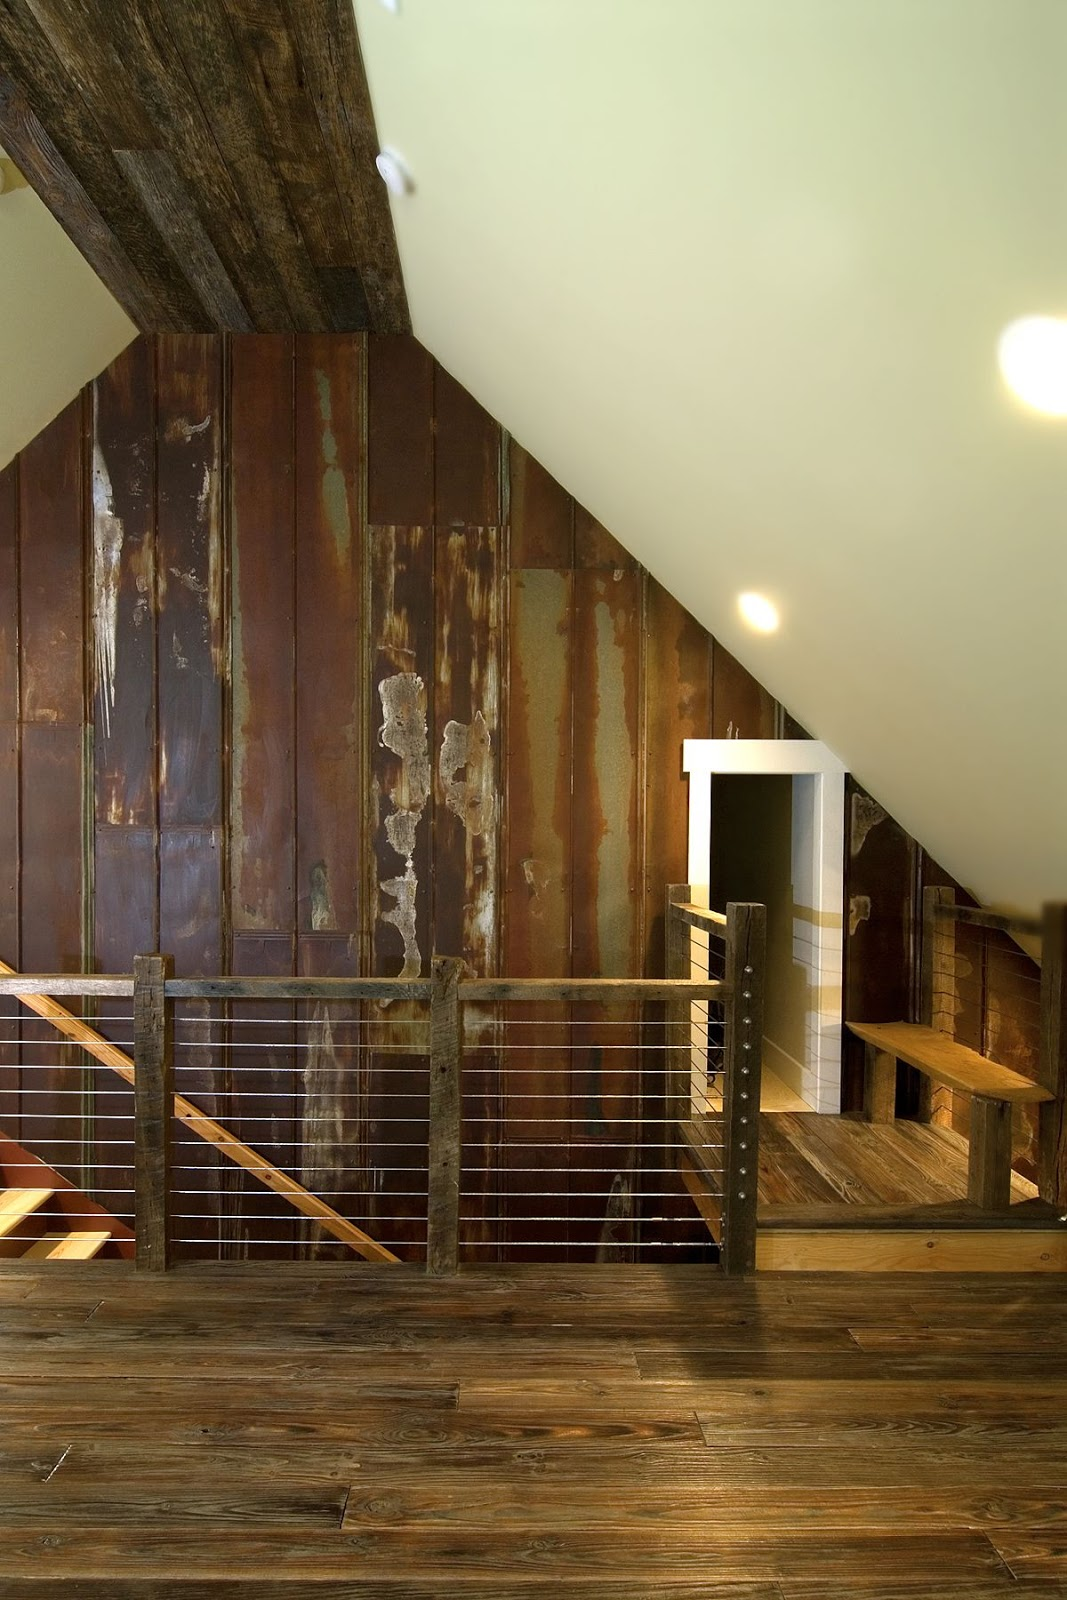 rusted barn tin ceiling - photo #15